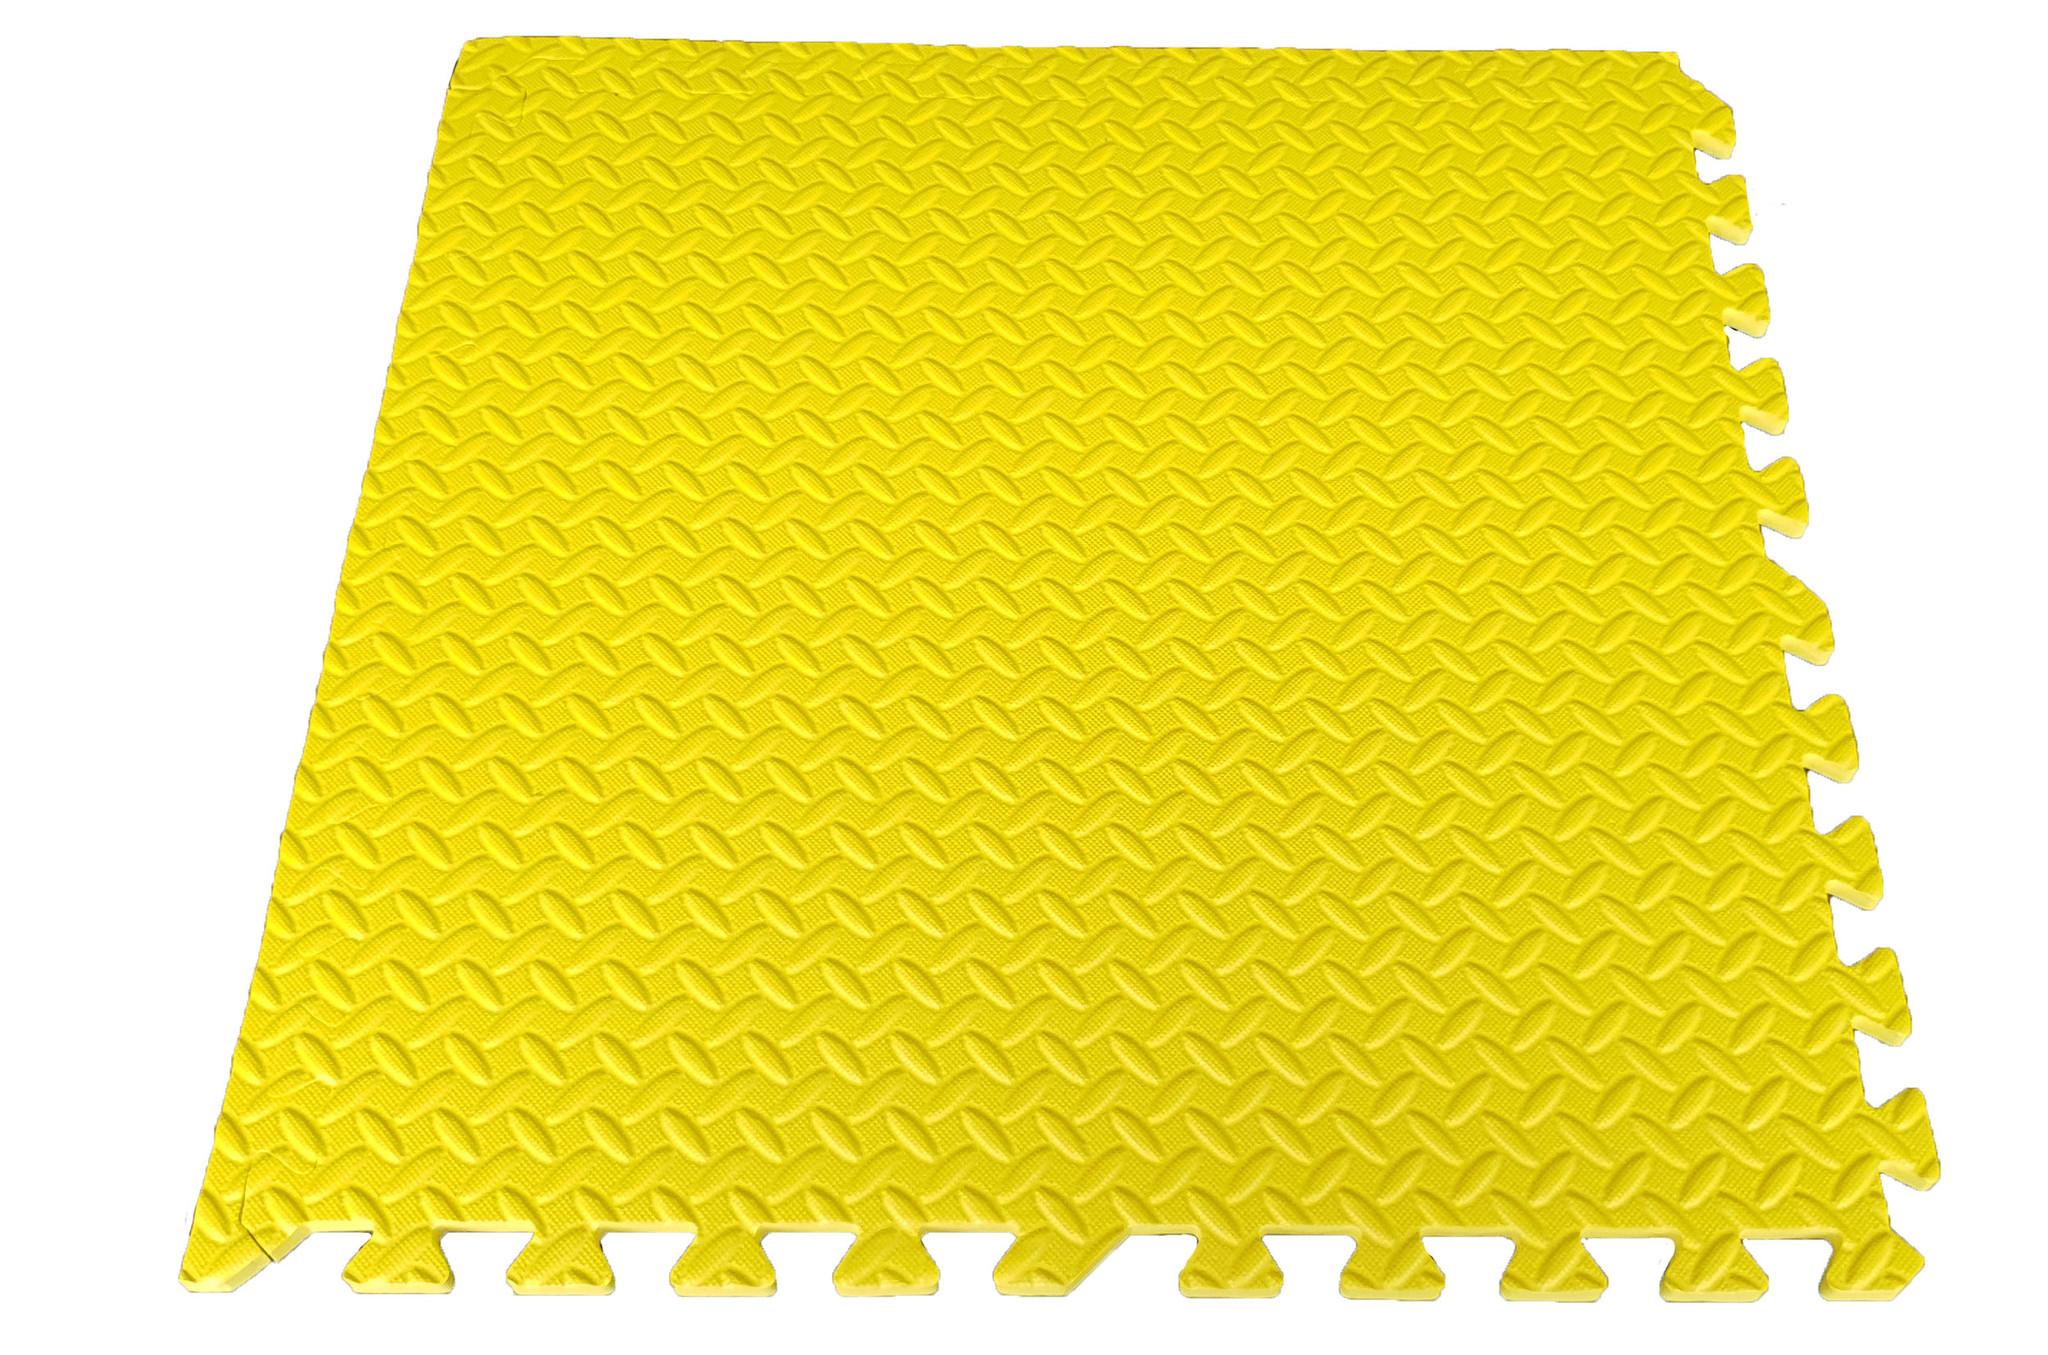 Puzzelmat 60 x 60 x 1.2 cm (geel)